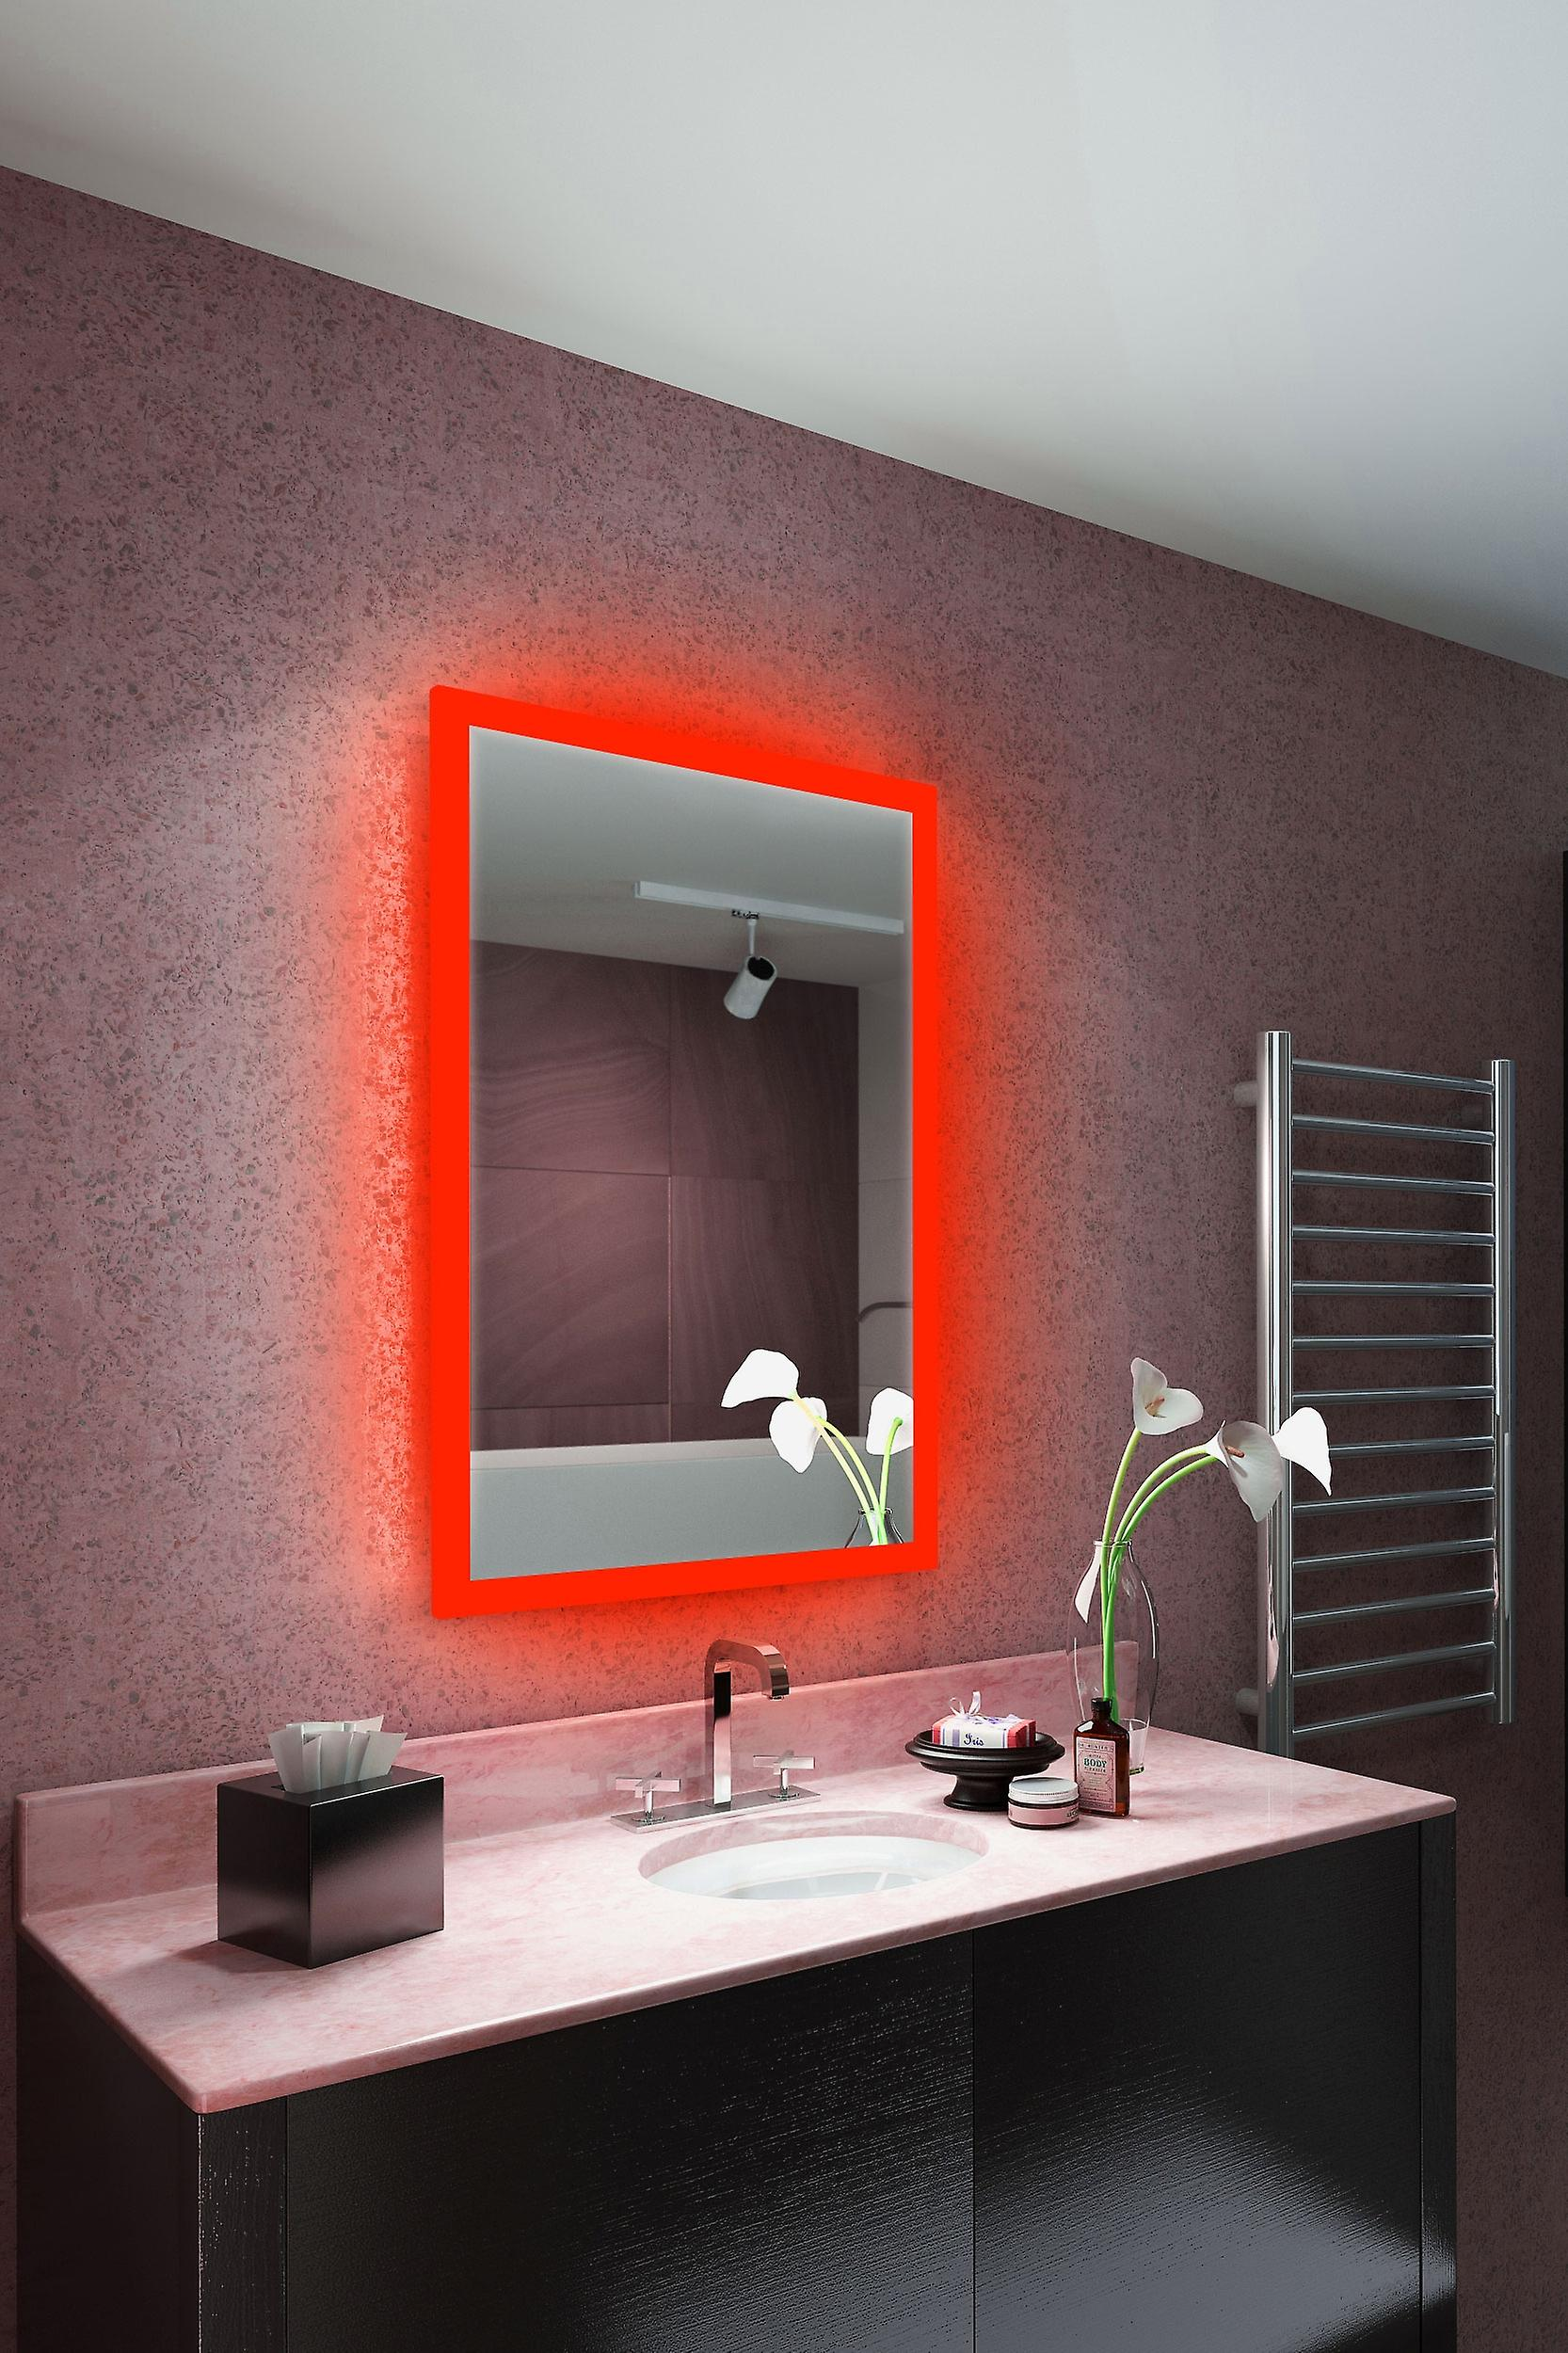 RGB Audio Shaver Mirror with Bluetooth Demist Sensor K8401vrgbaud